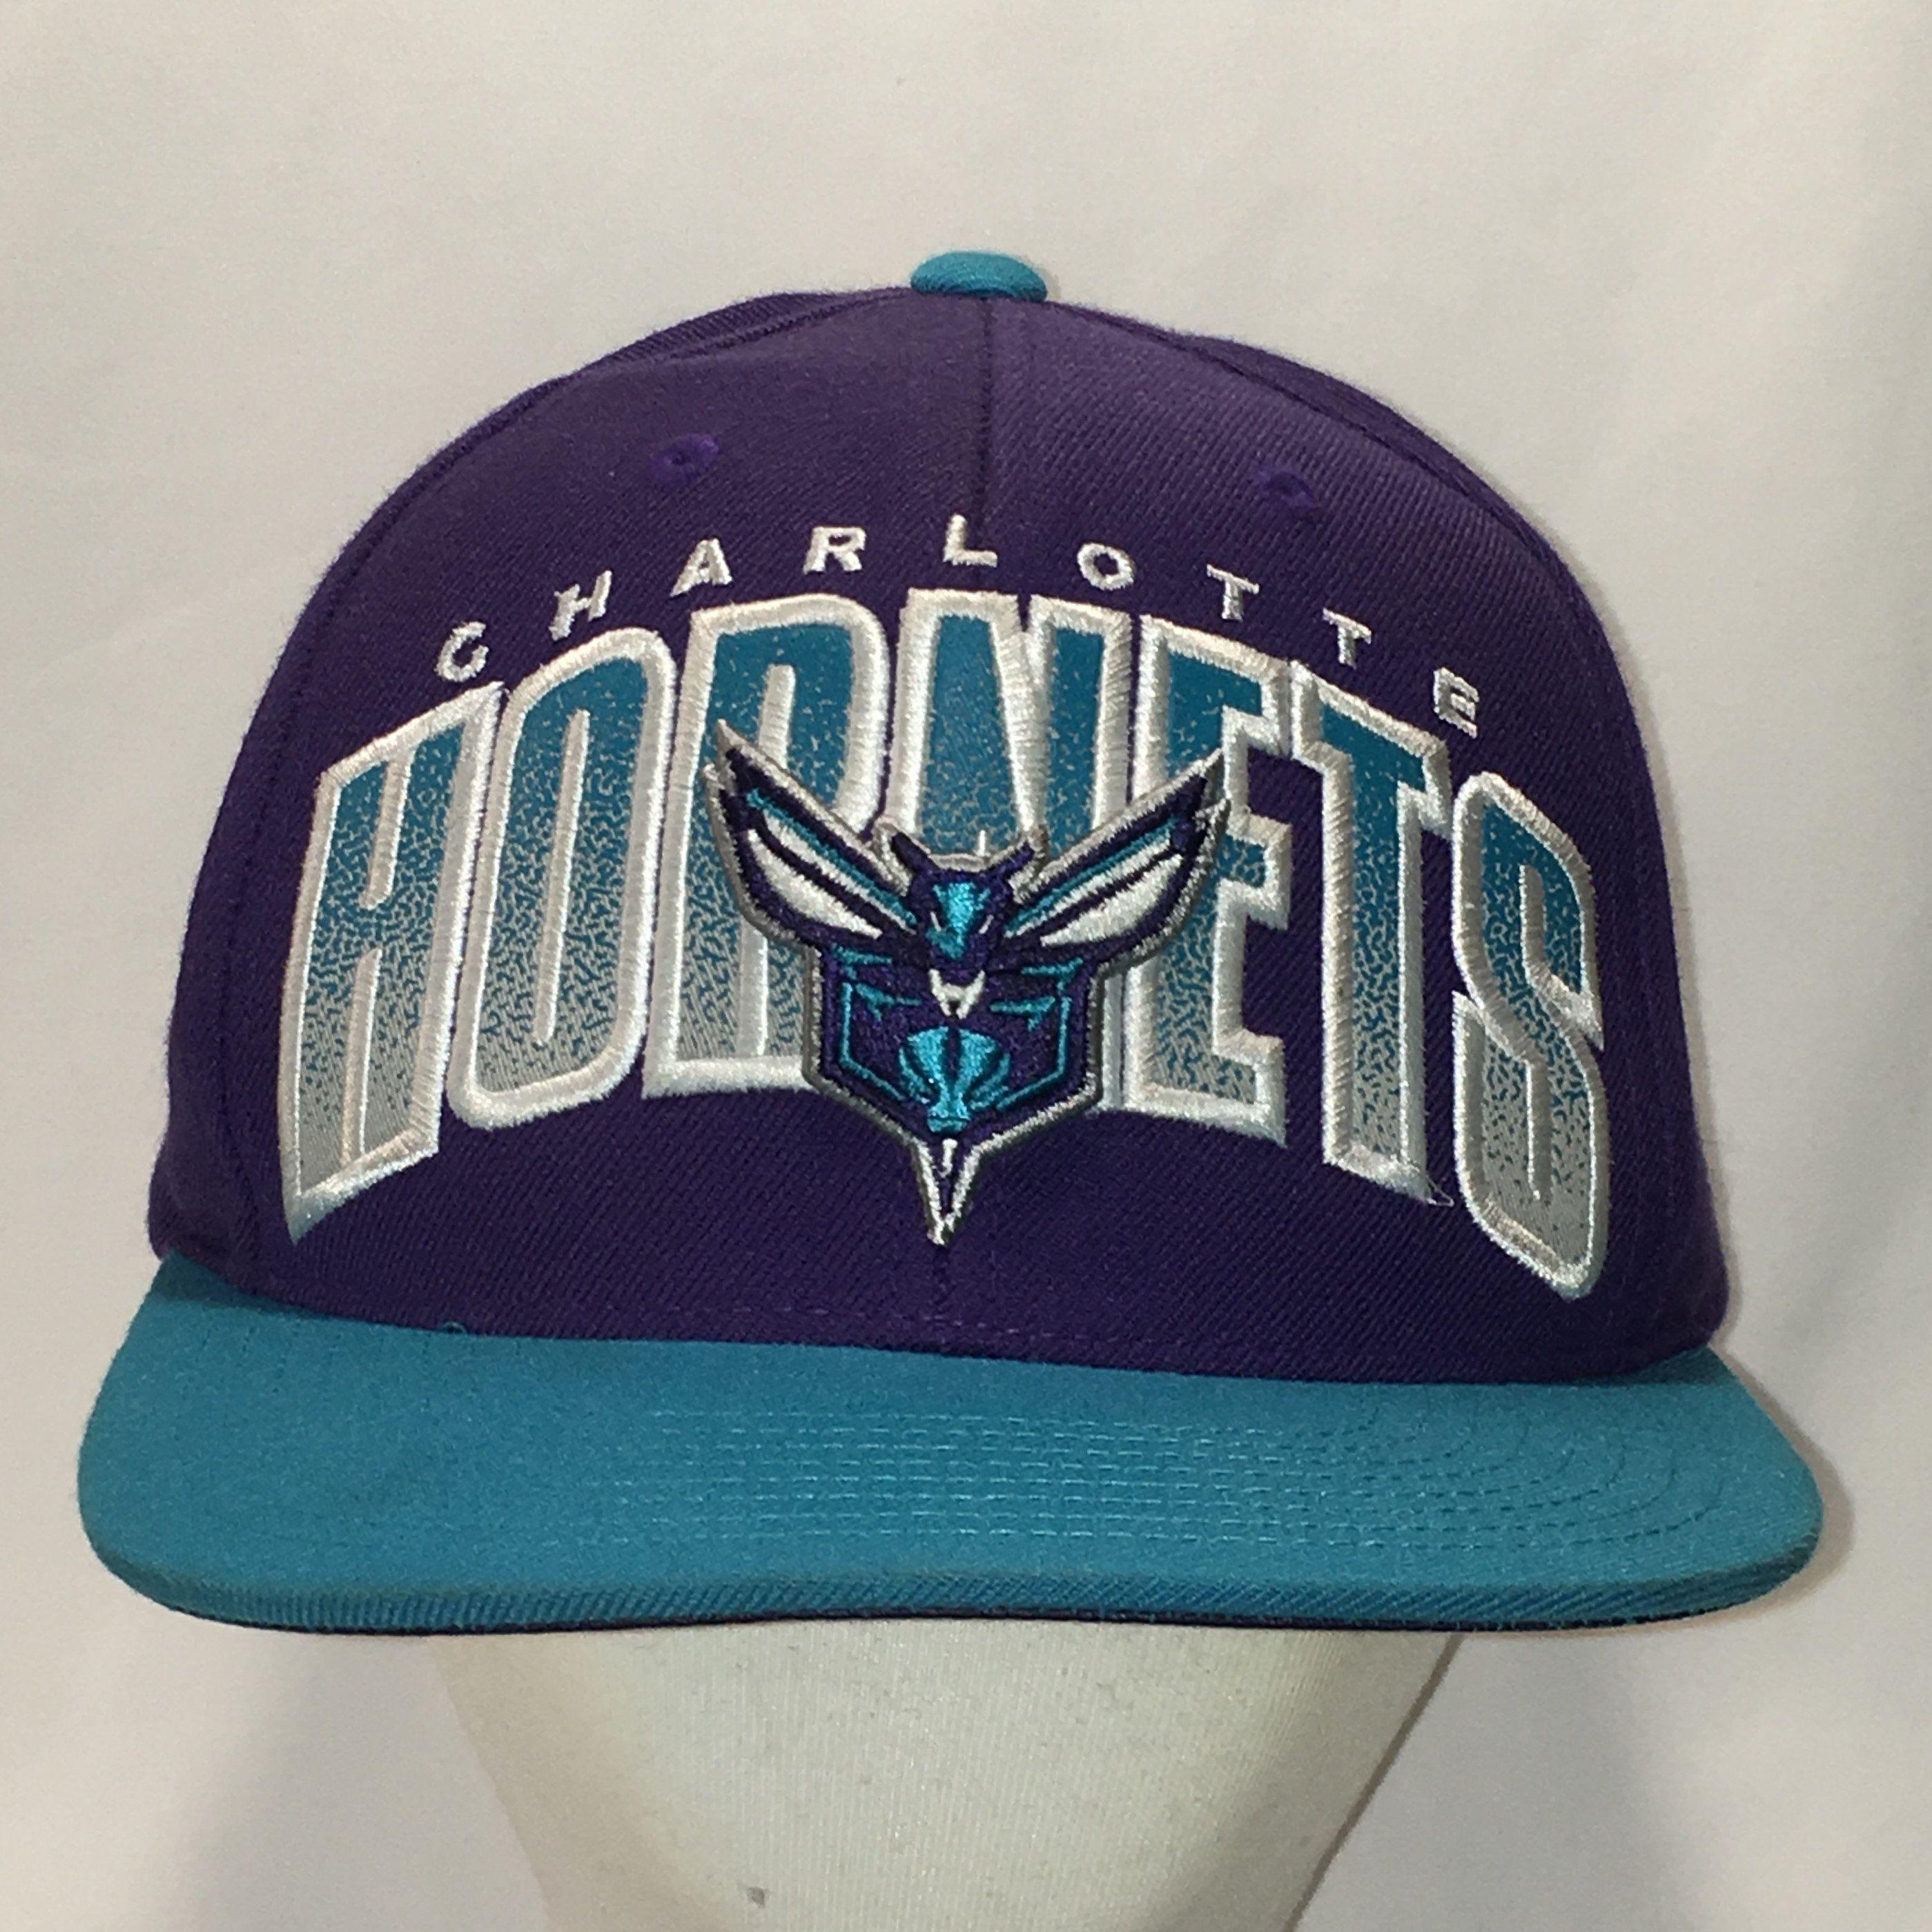 48507659 Vintage Charlotte Hornets Snapback Hat NBA Basketball Baseball Cap Purple  Blue Wool Blend Mitchell & Ness